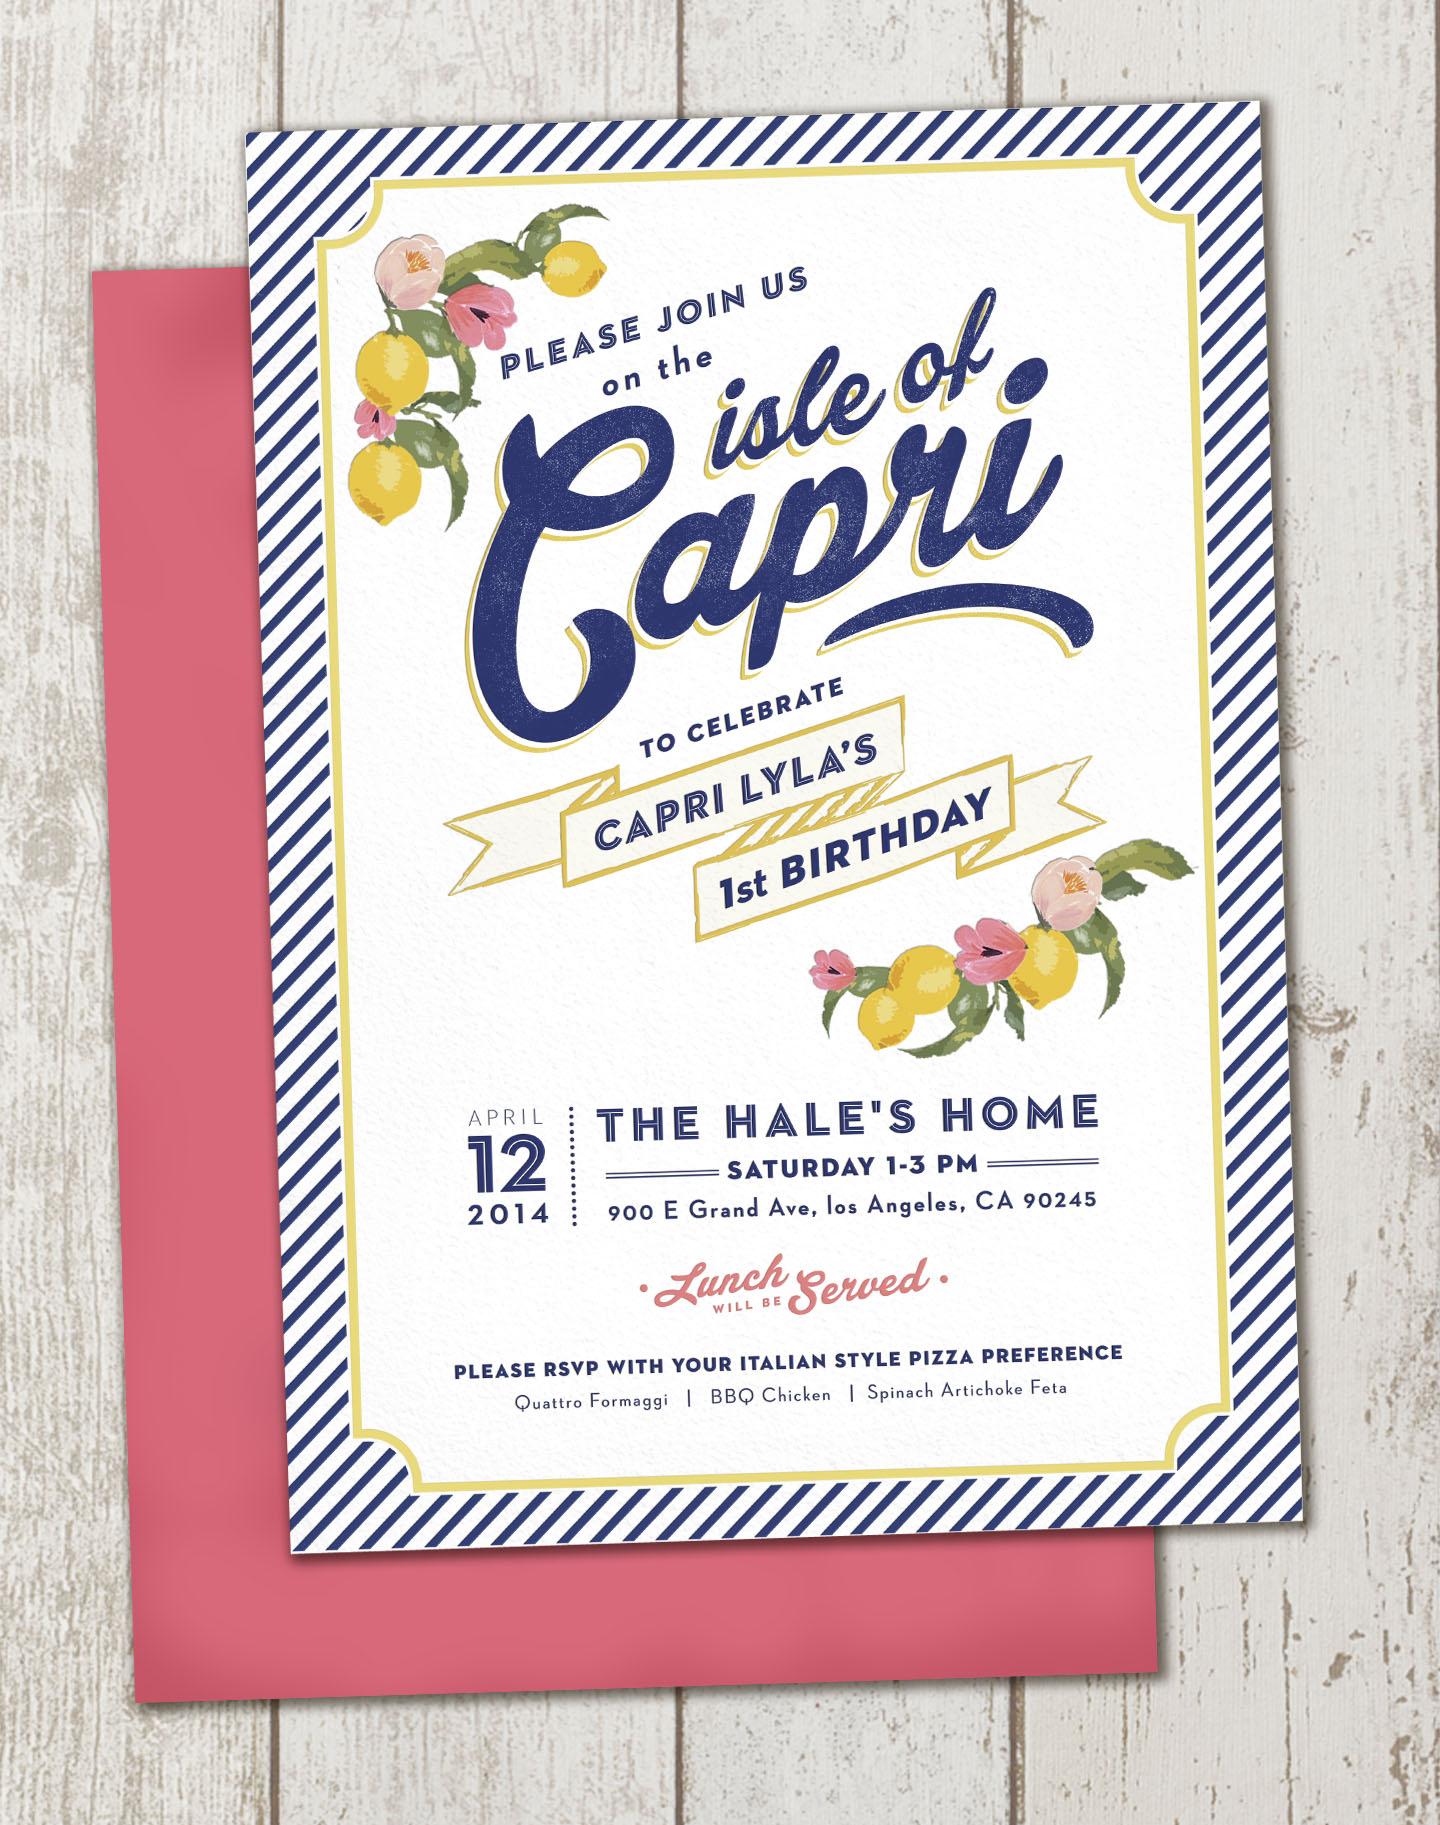 Capri's Birthday West Coast Capri